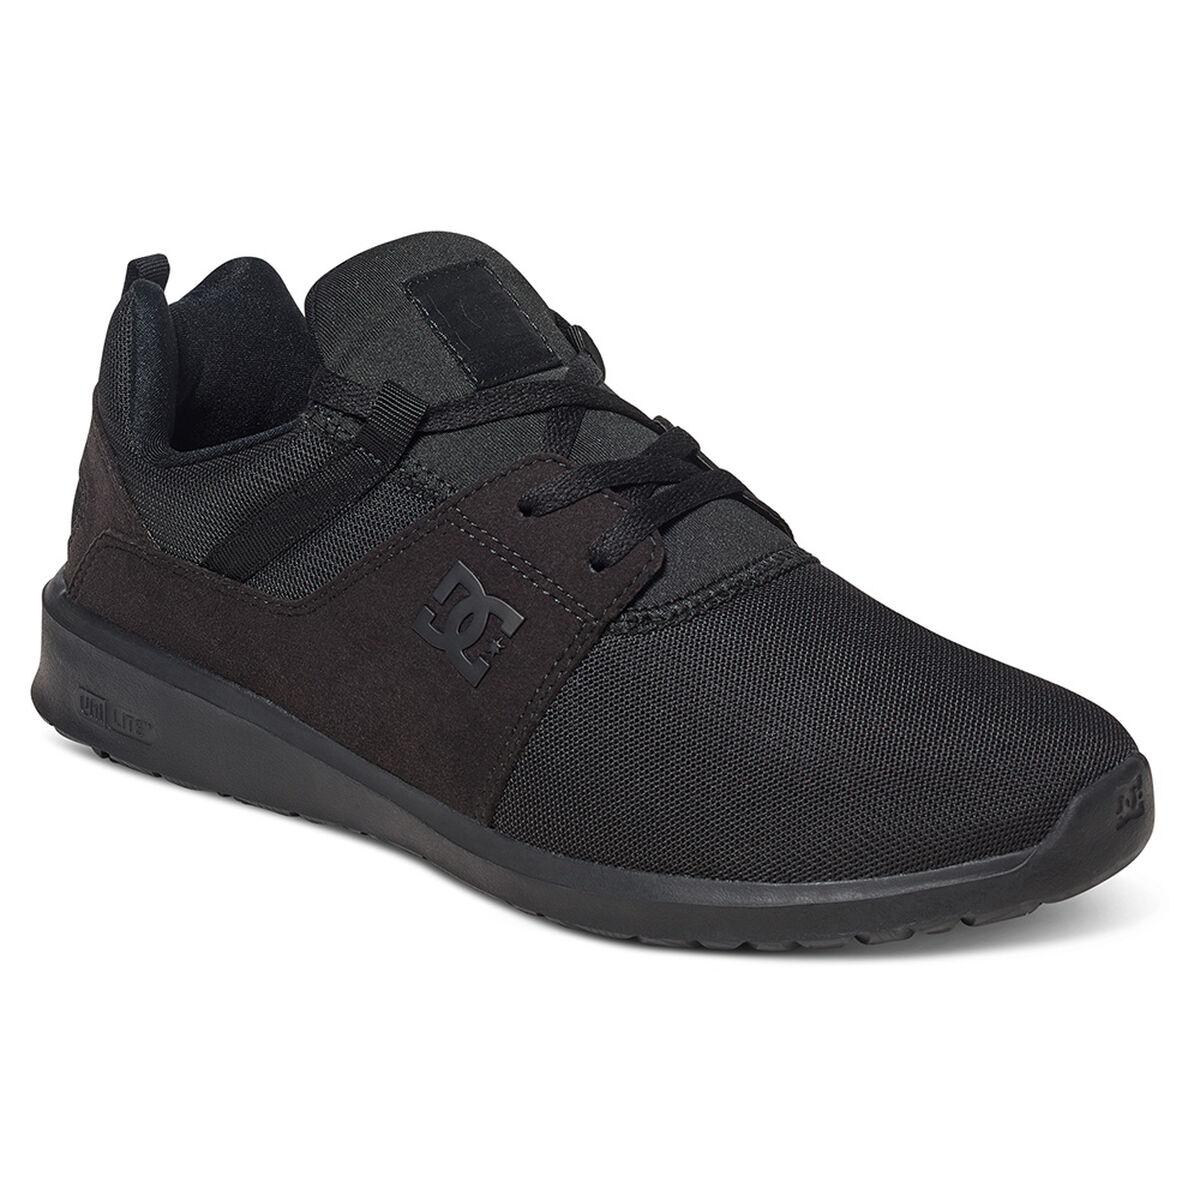 Zapatilla Hombre DC Heathrow M Shoe 3Bk